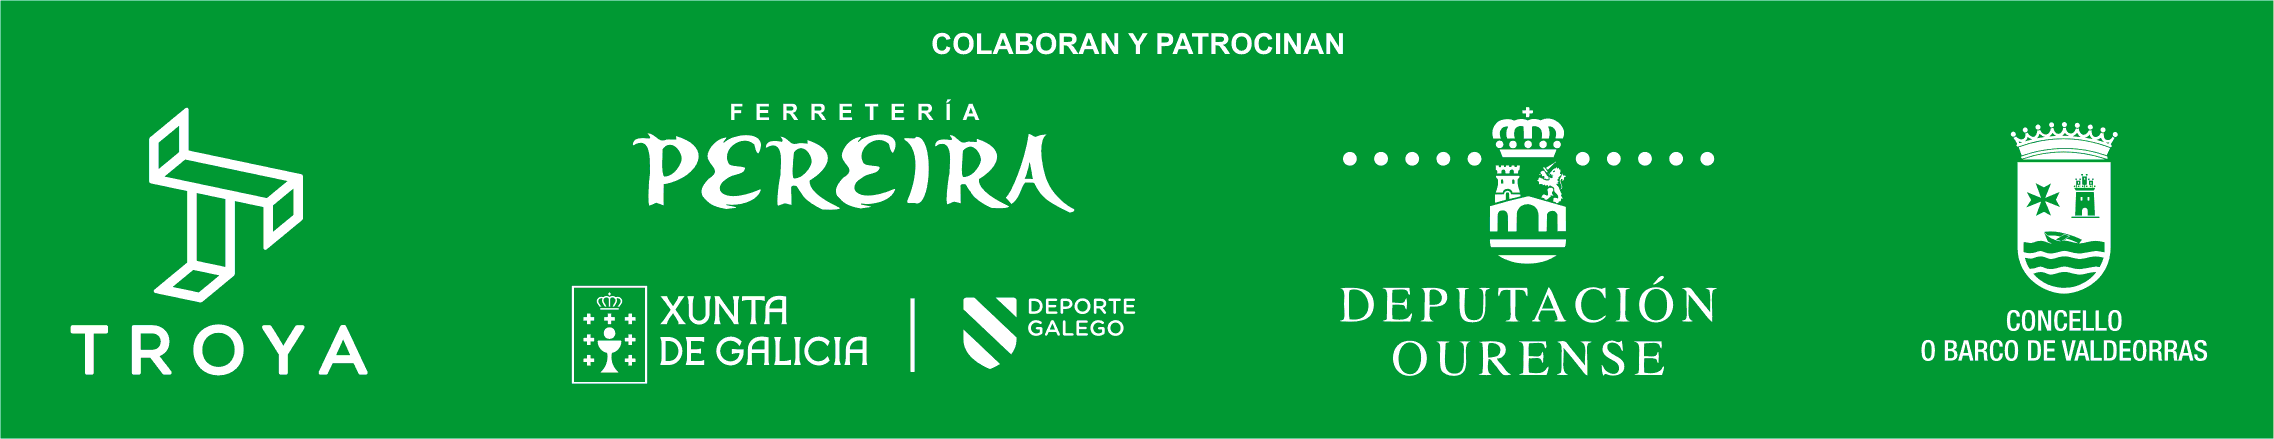 banner-web-patrocinadores-2016-2017